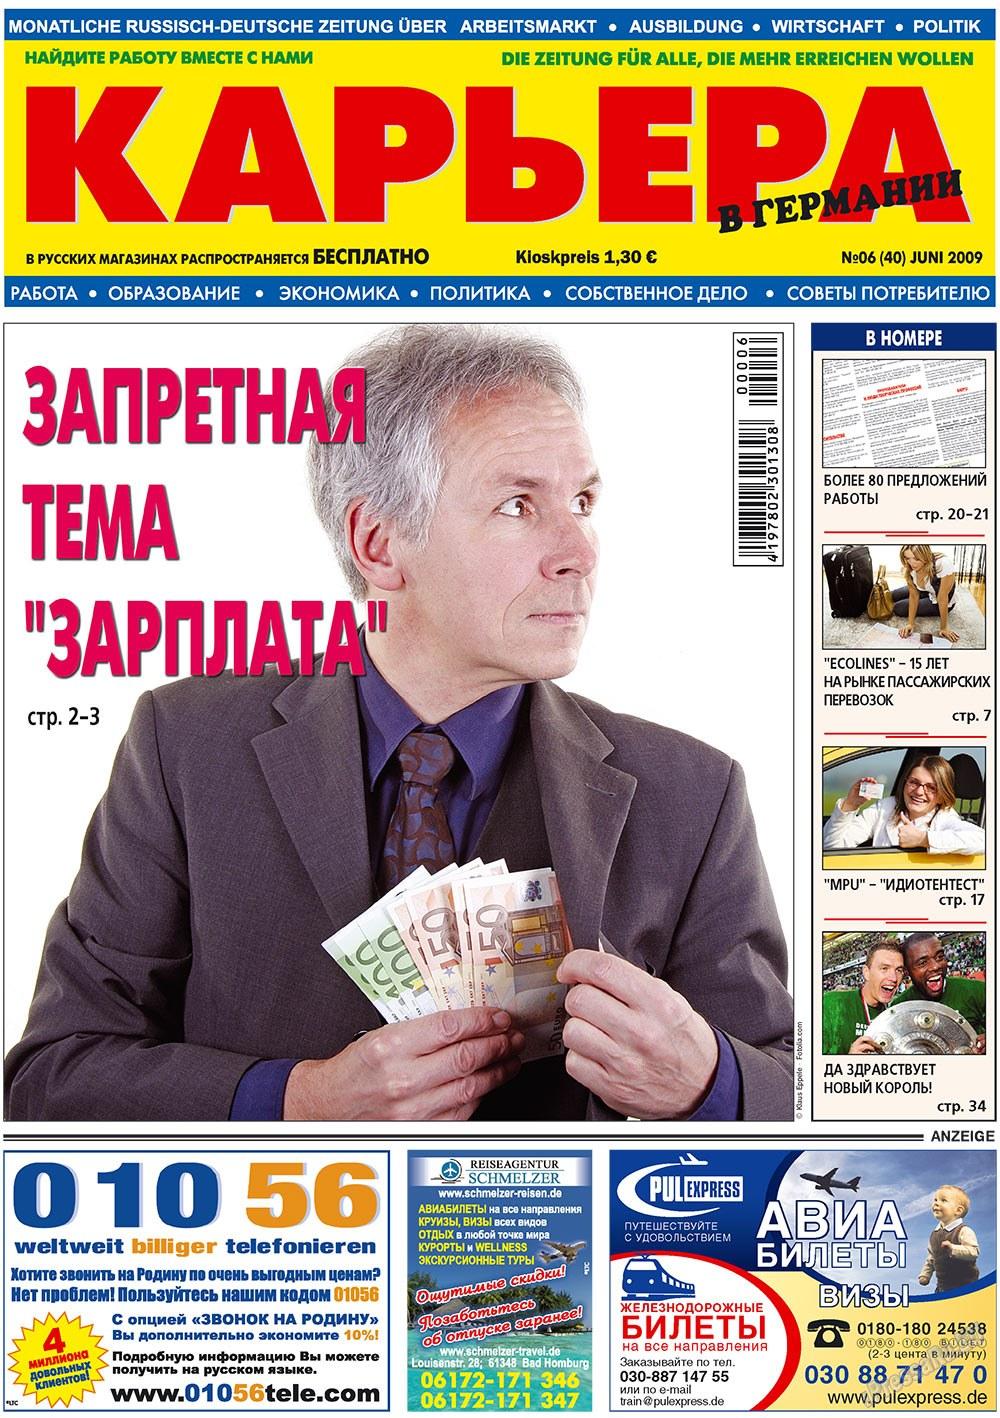 Карьера (газета). 2009 год, номер 6, стр. 1